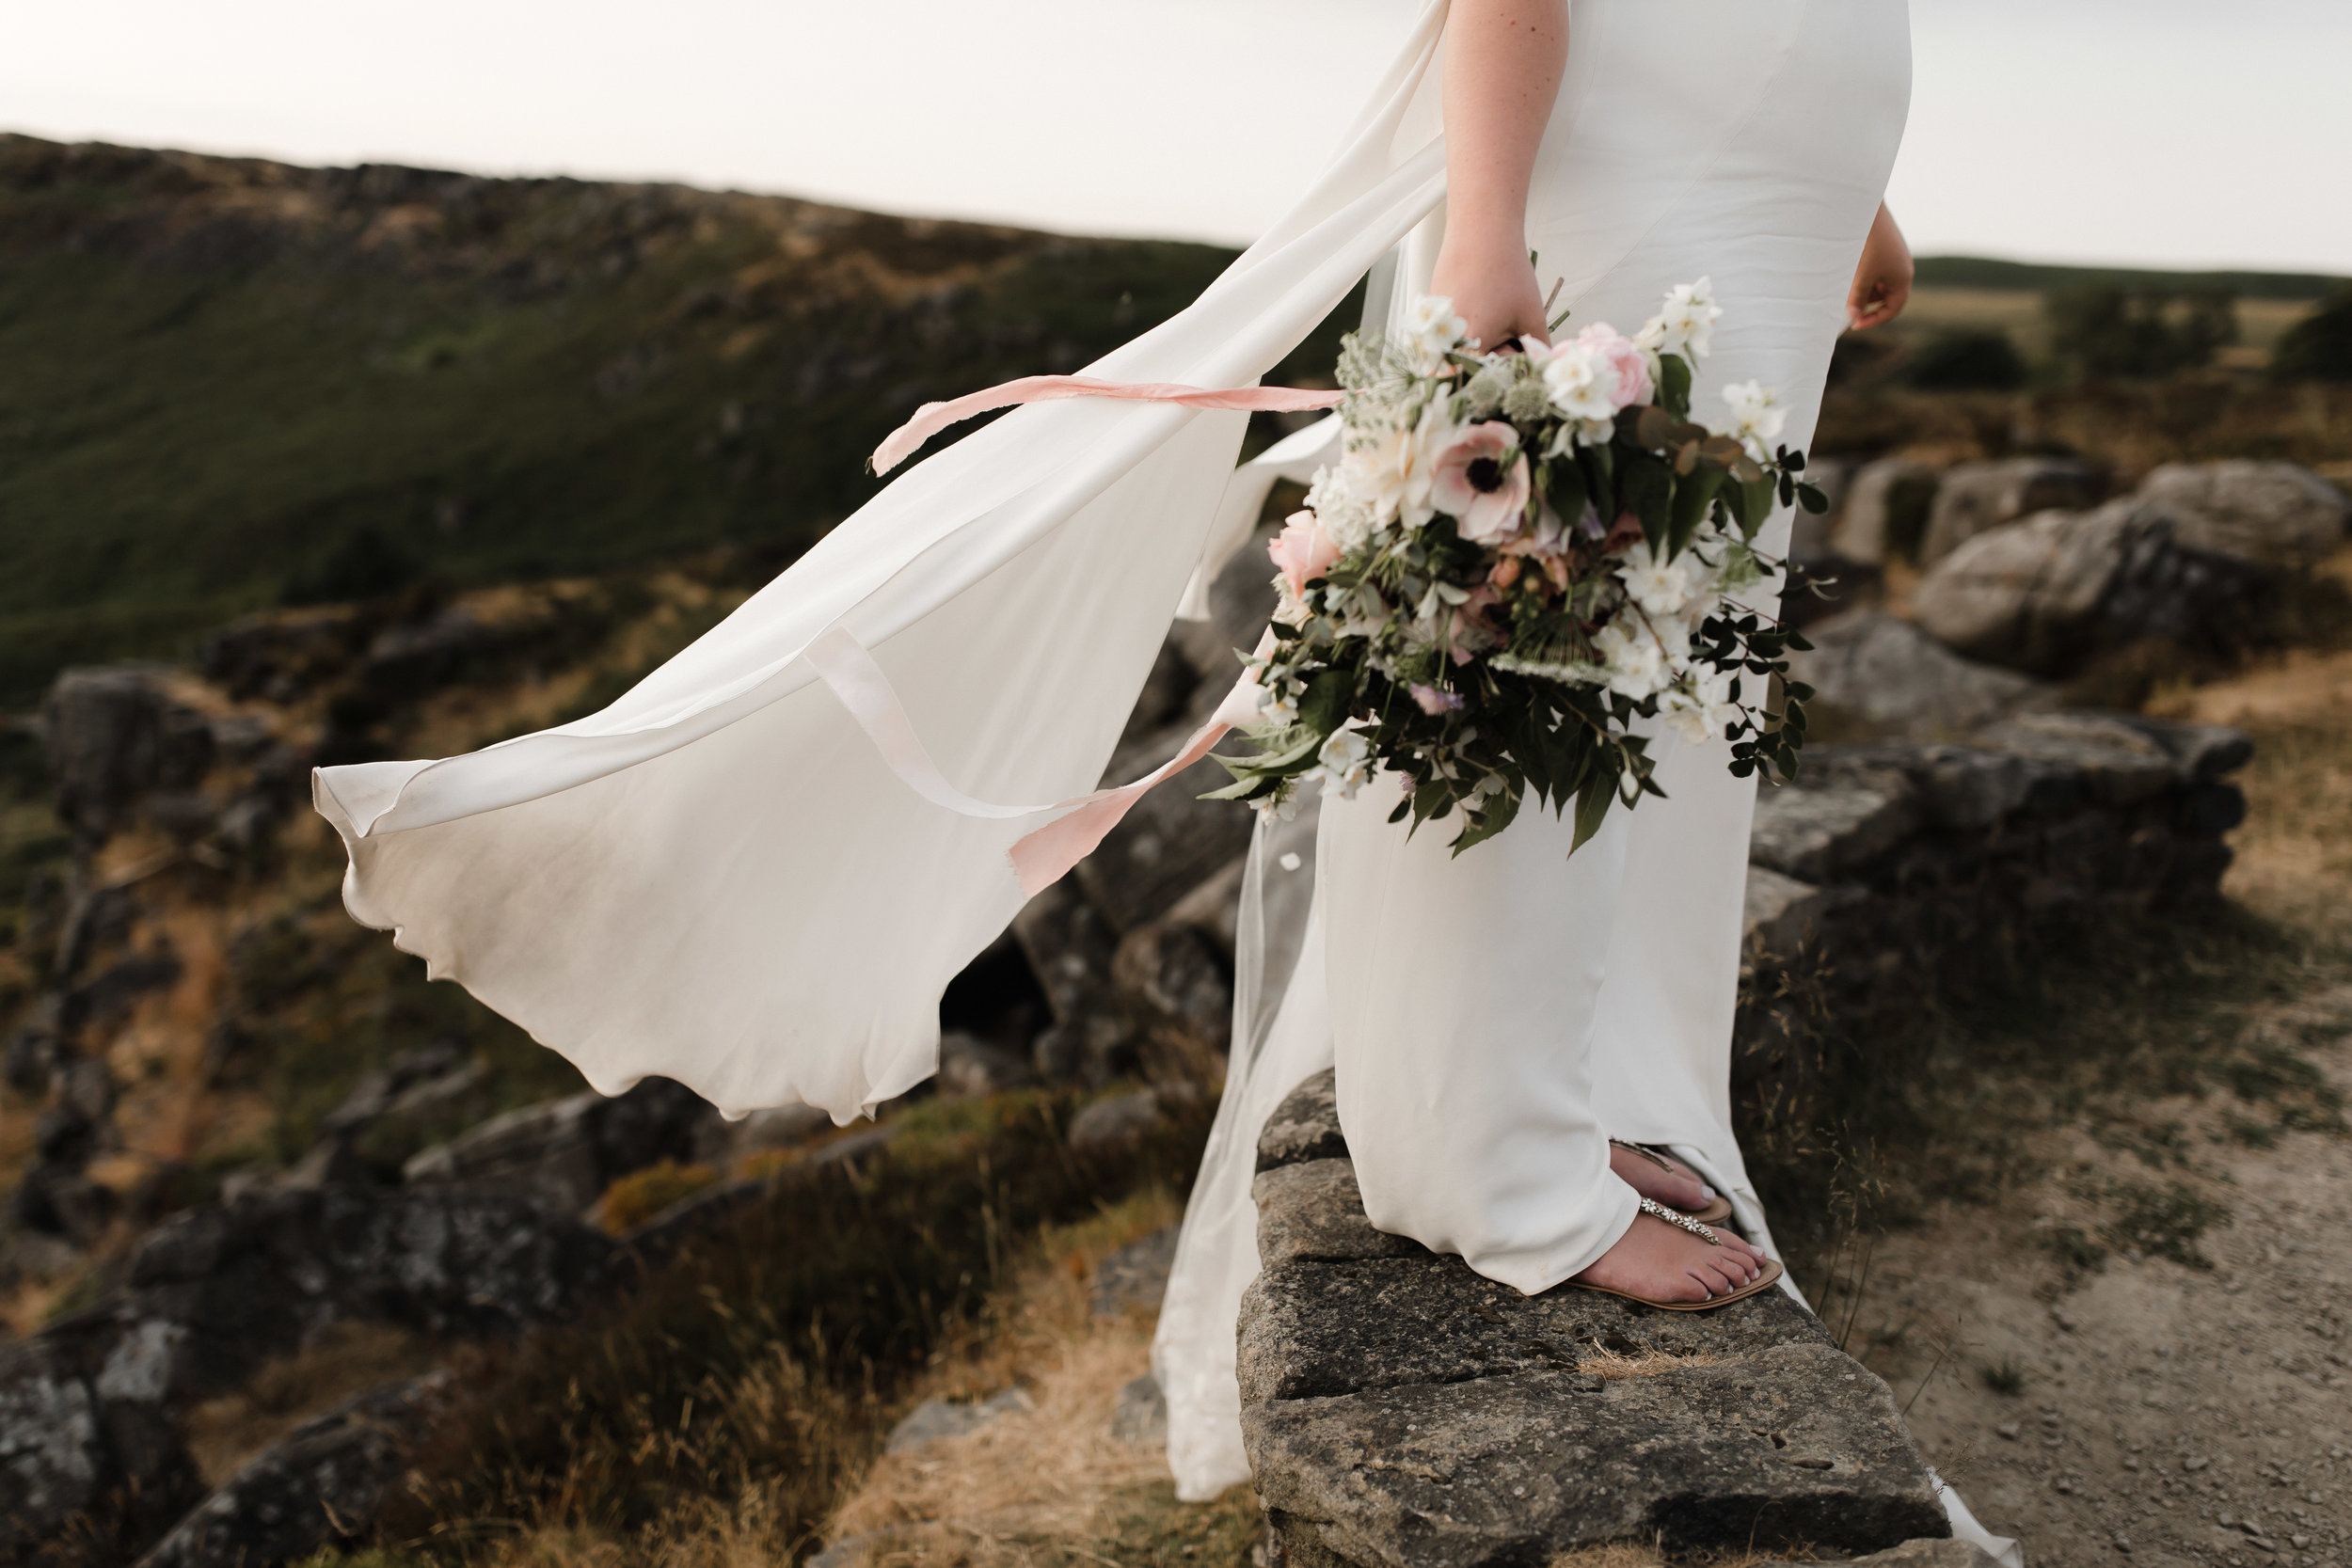 Lauren-Peak-District-Bespoke-Wedding-Gown-Petal-Veil-Train-Long-Sleeve-Susanna-Greening-Designs-Matlock-Derbyshire-22